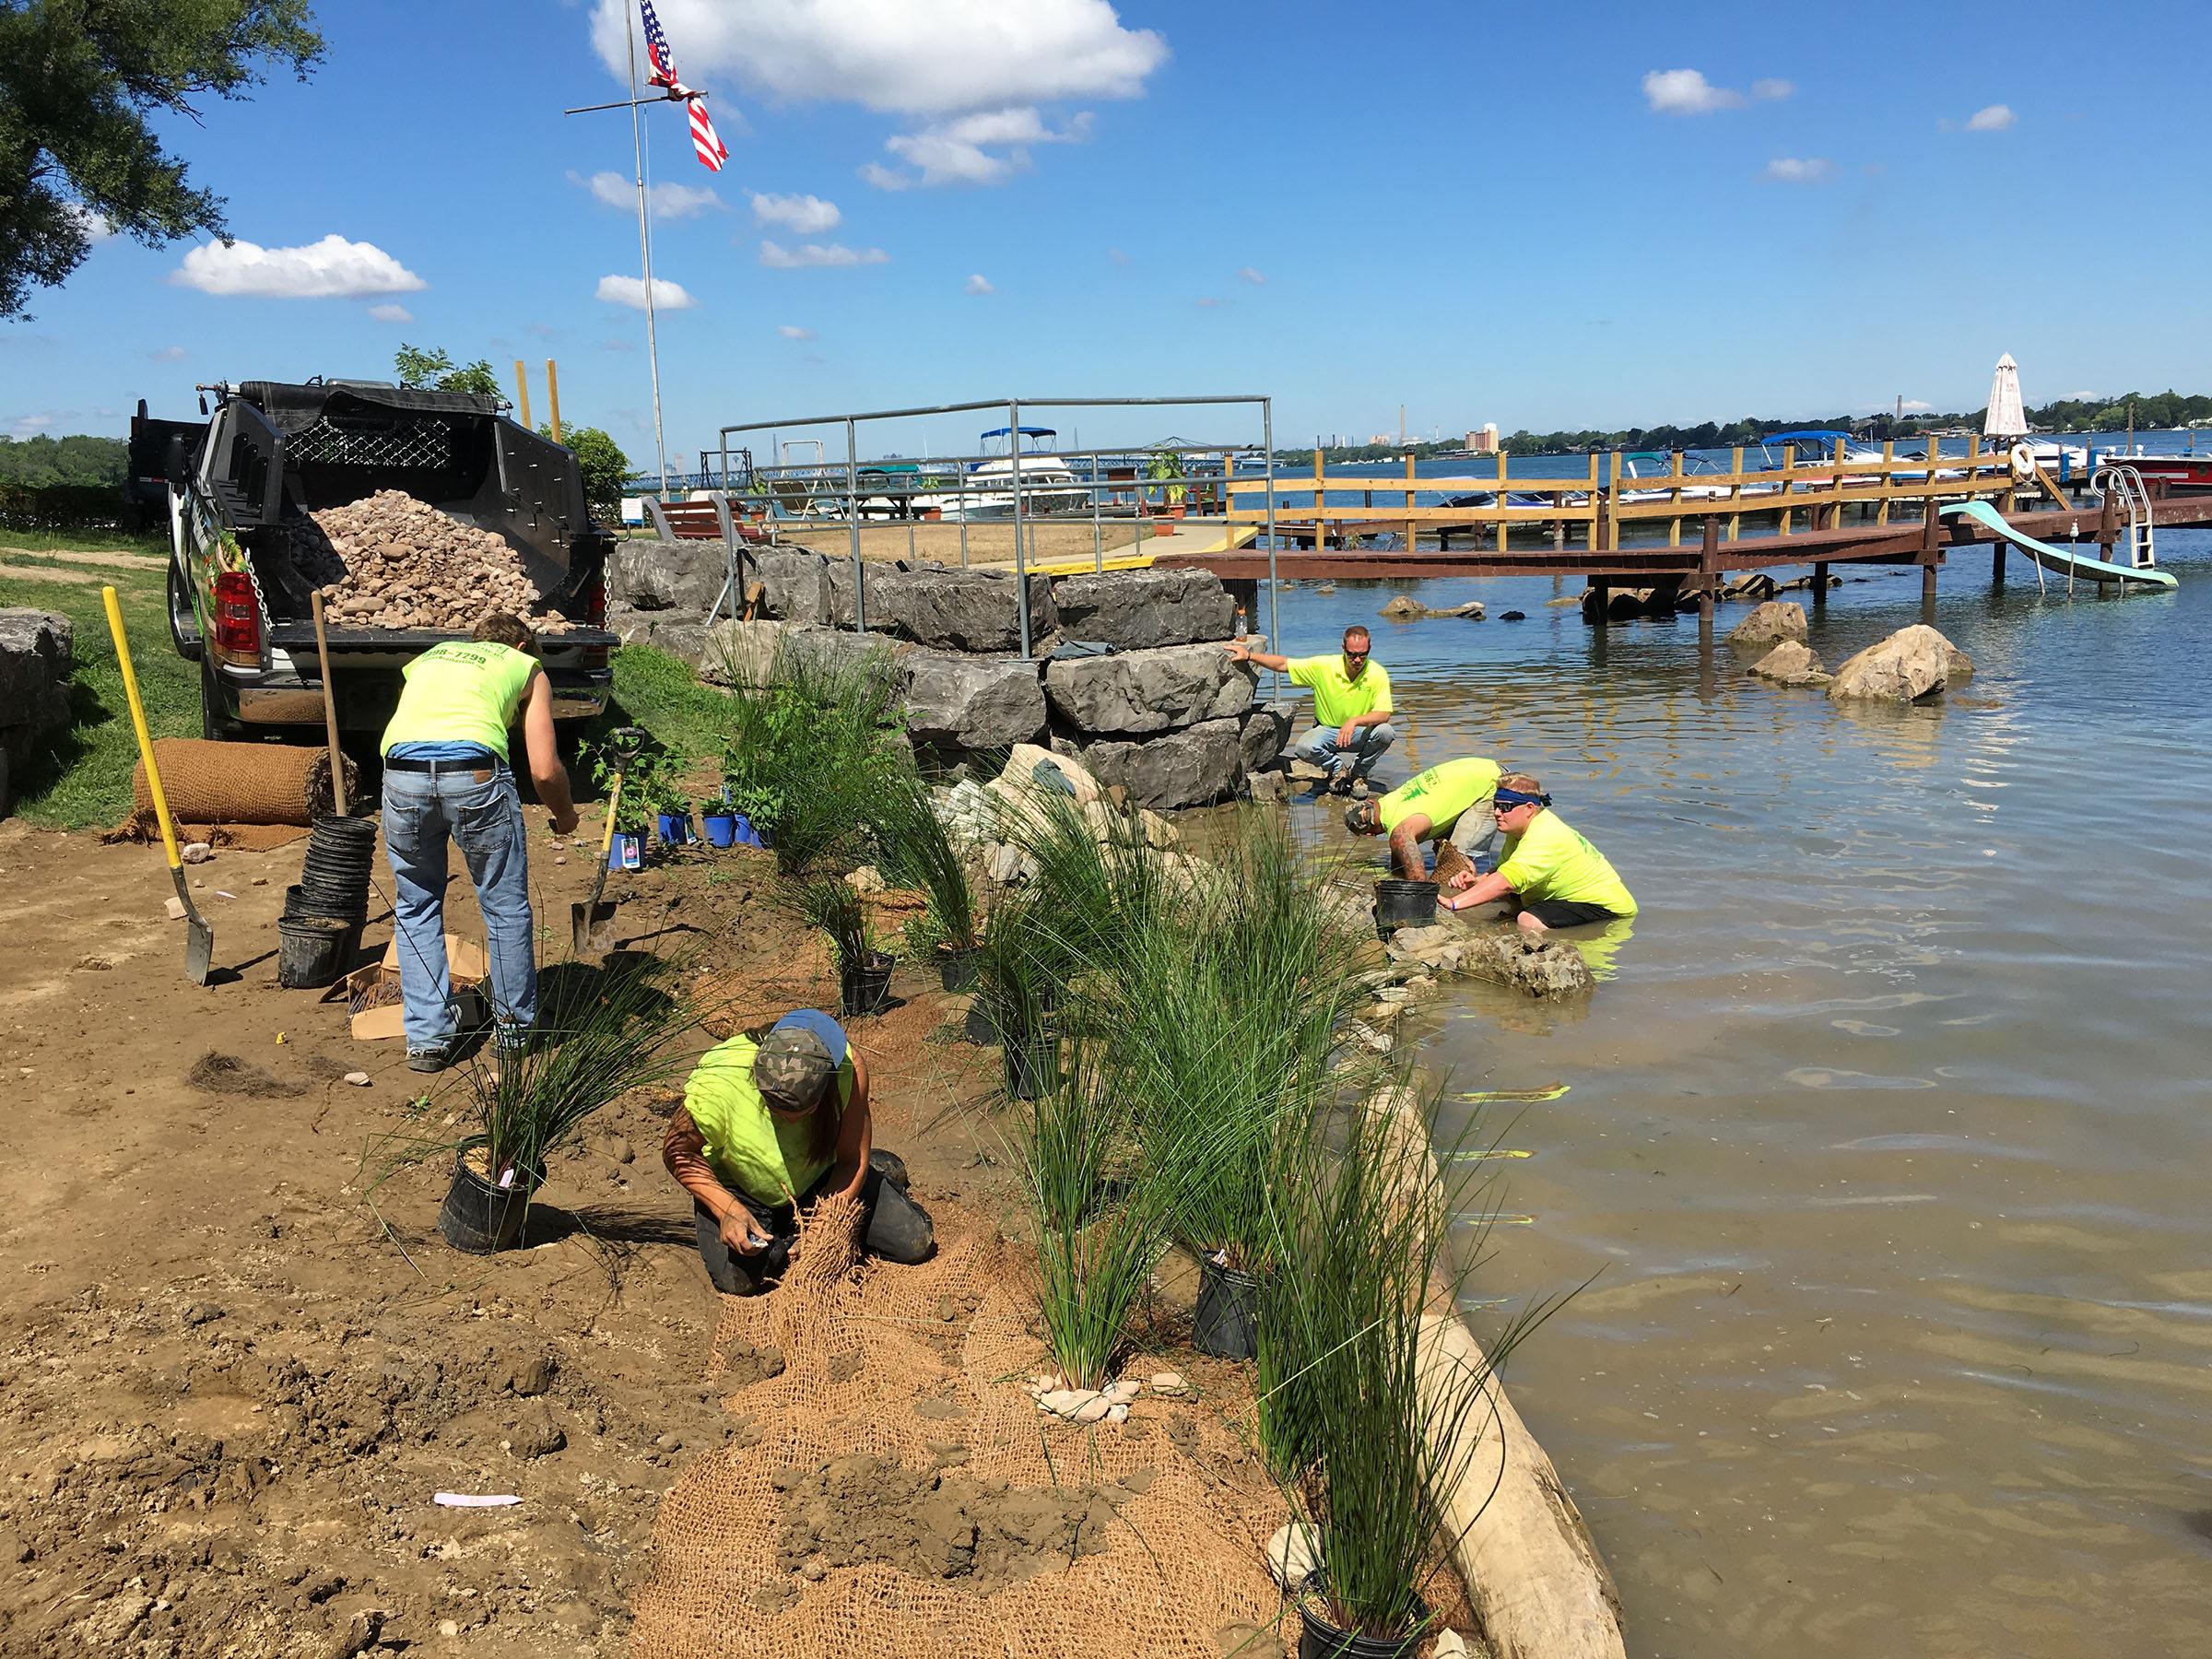 New vegetation planted at Sandy Beach Park Club is helping restore the Niagara River at Grand Island. (Photo from Buffalo Niagara Riverkeeper)